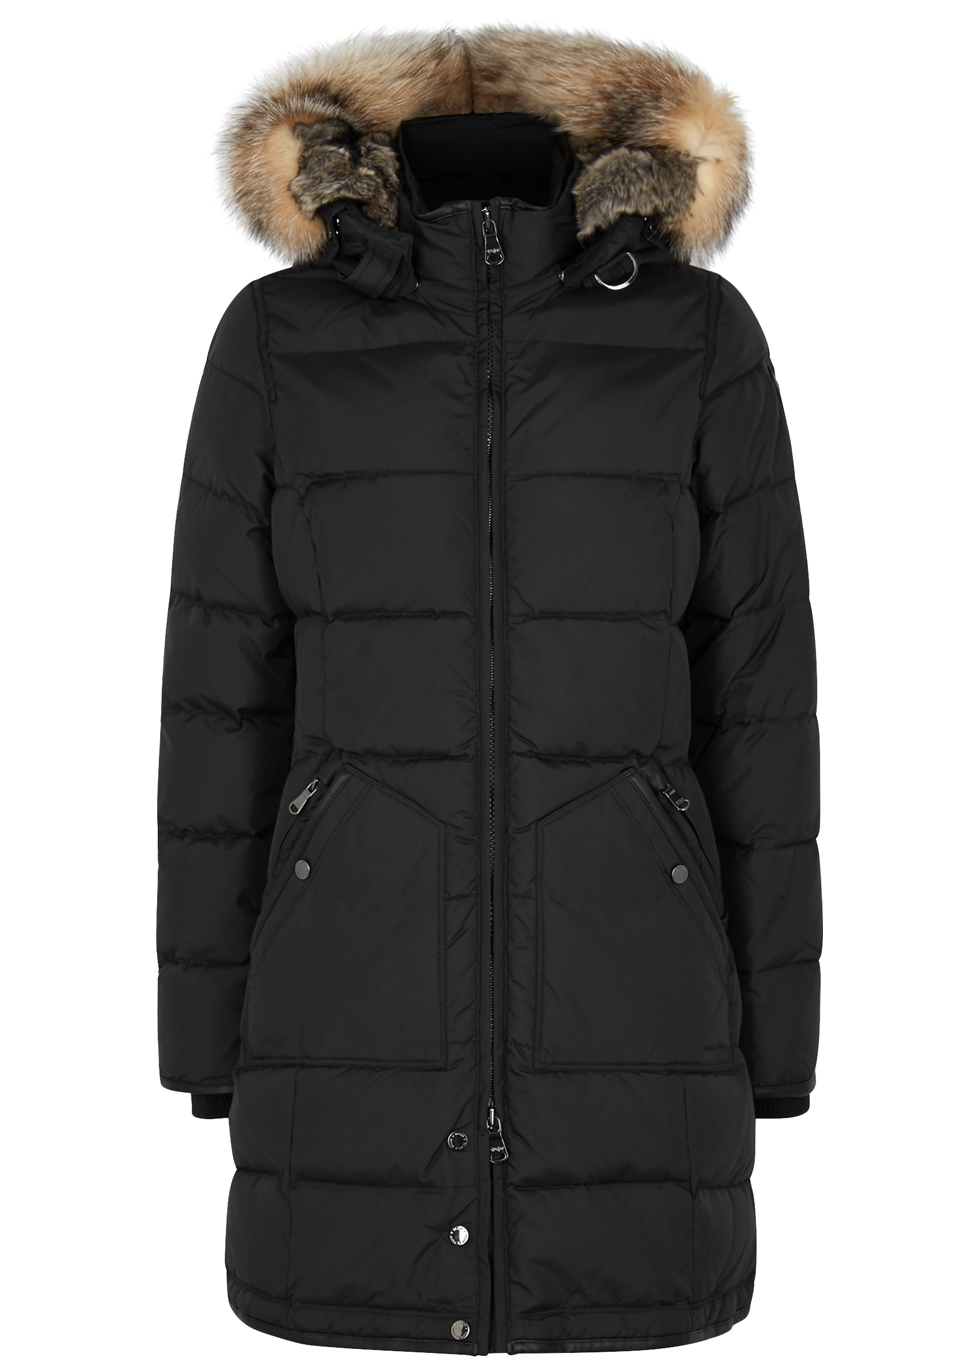 PAJAR Panther Black Fur-Trimmed Shell Coat